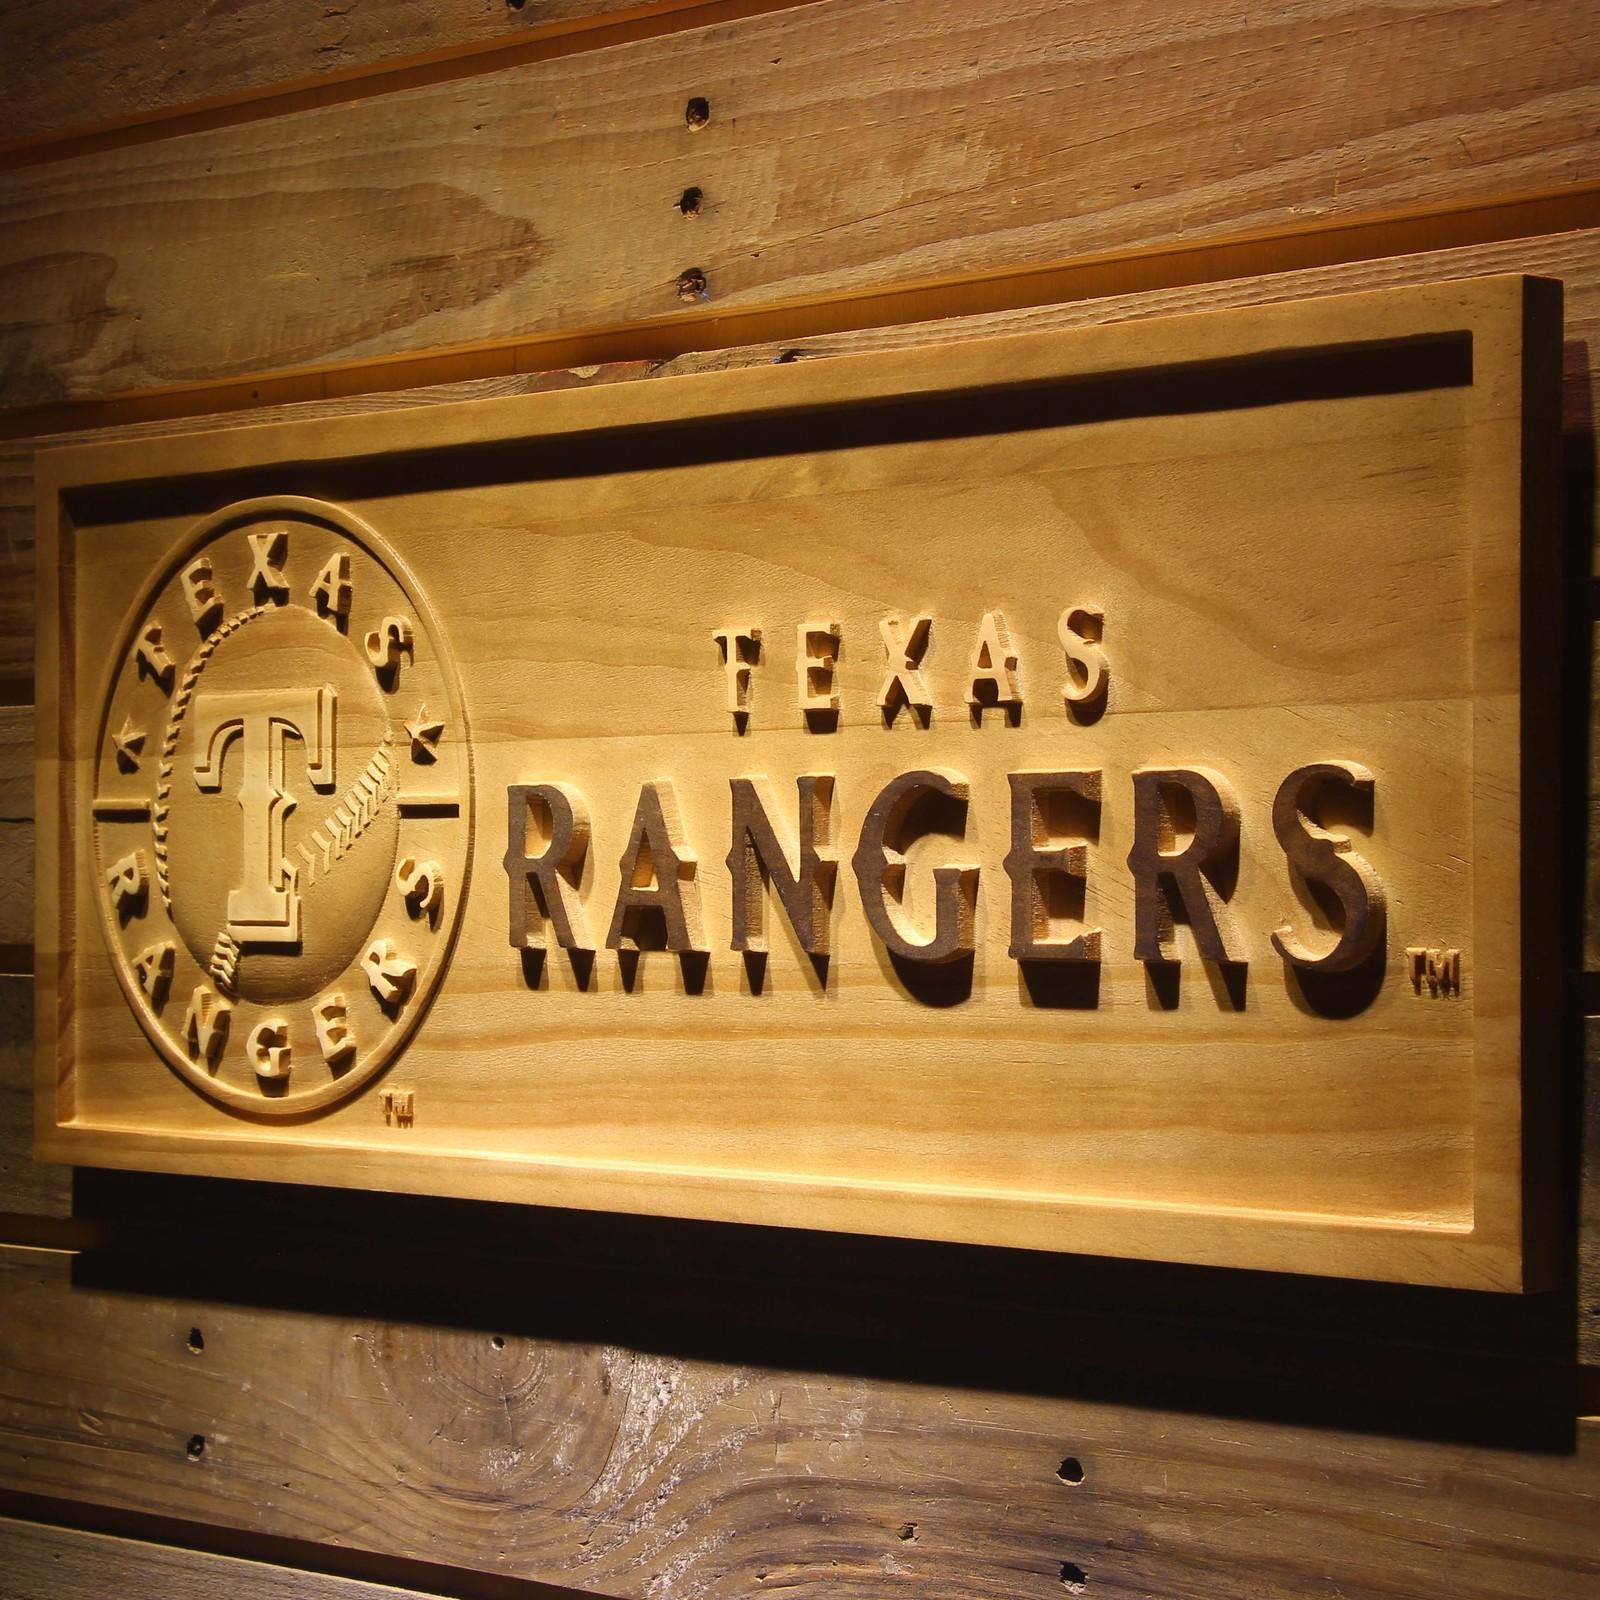 Baseball Home Decor: Texas Rangers MLB Baseball Team Wooden Sign Wall Art Home